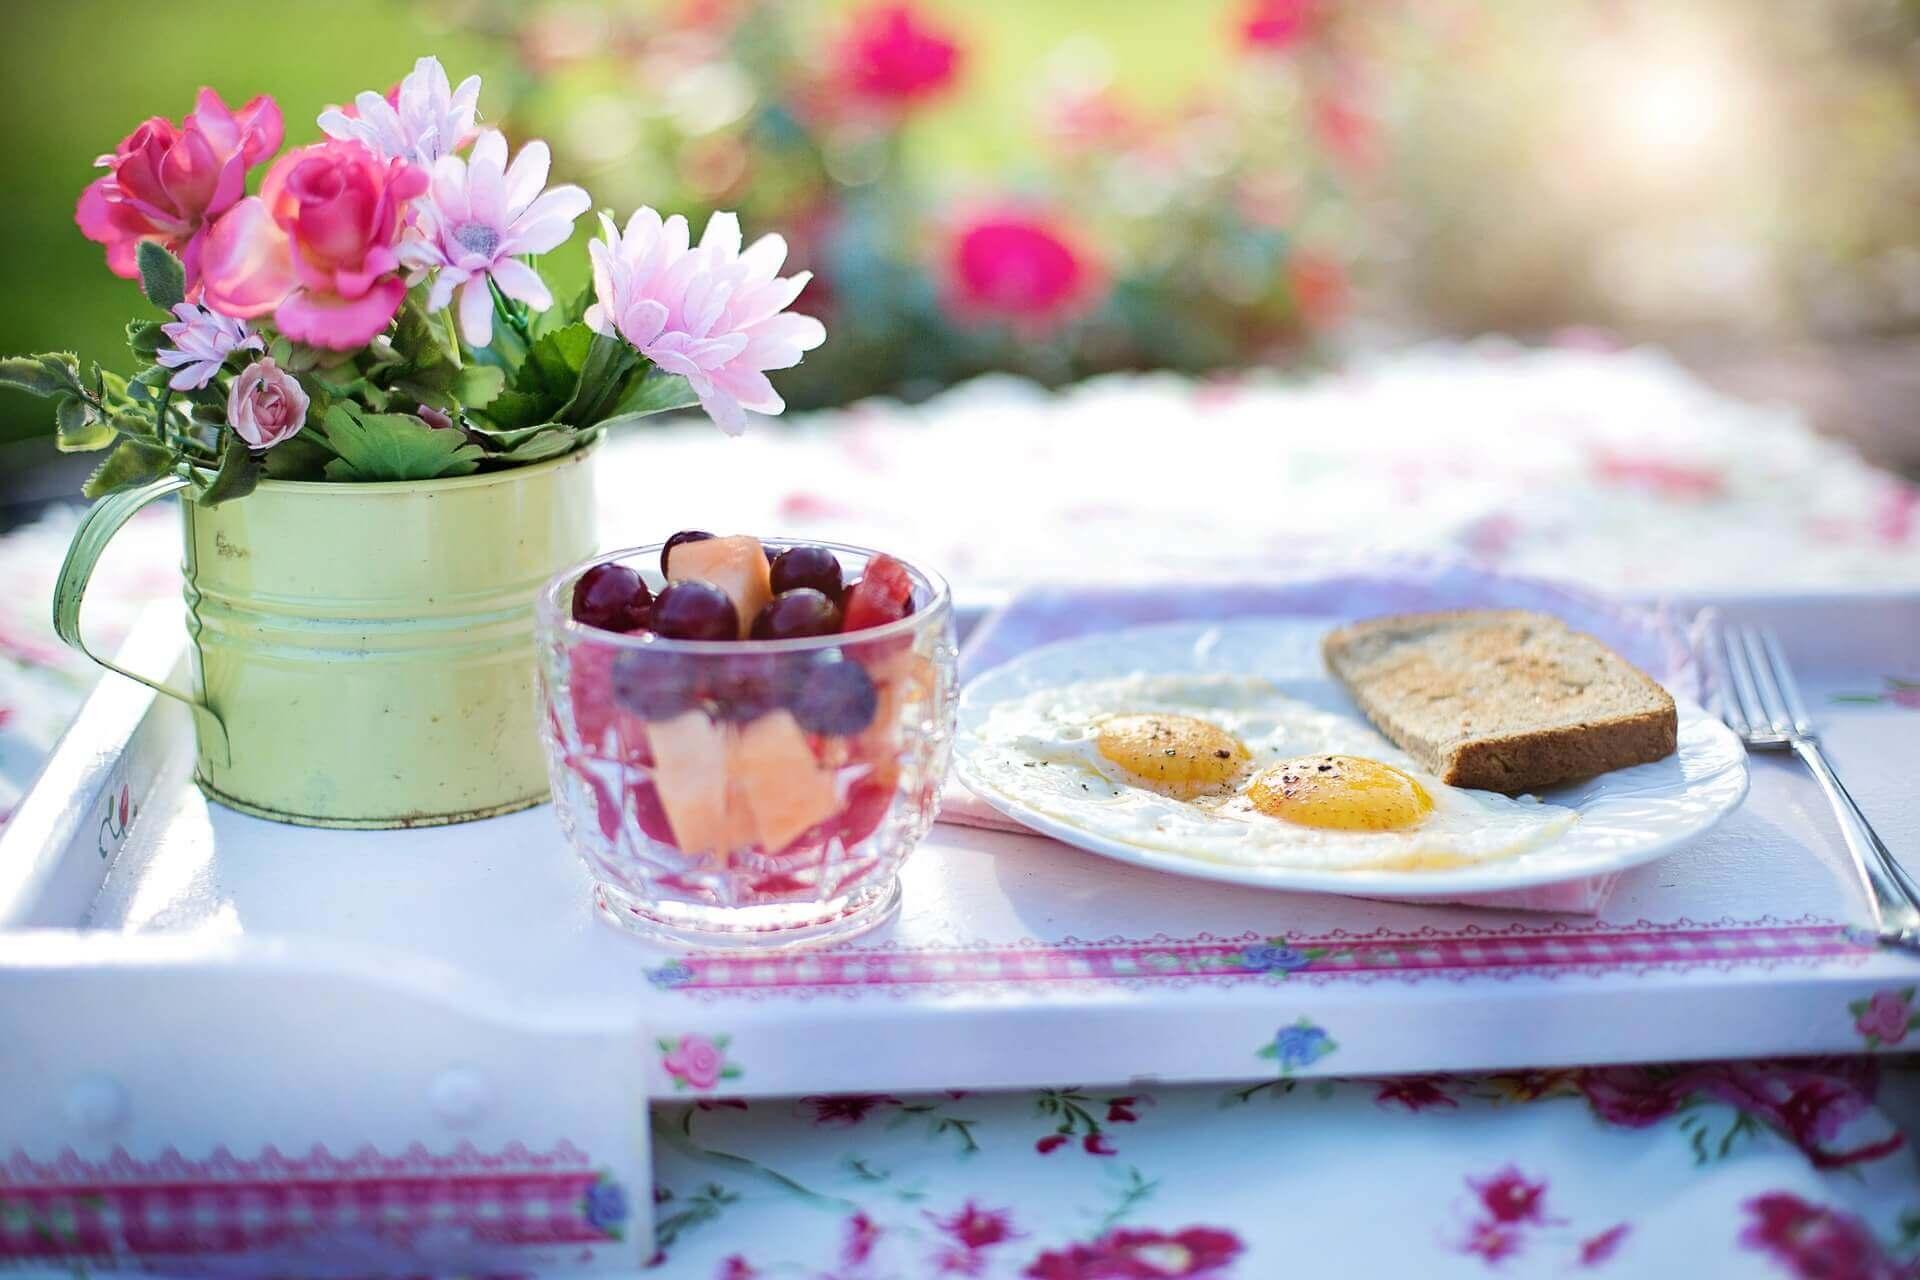 bahçede kahvaltı yapmak